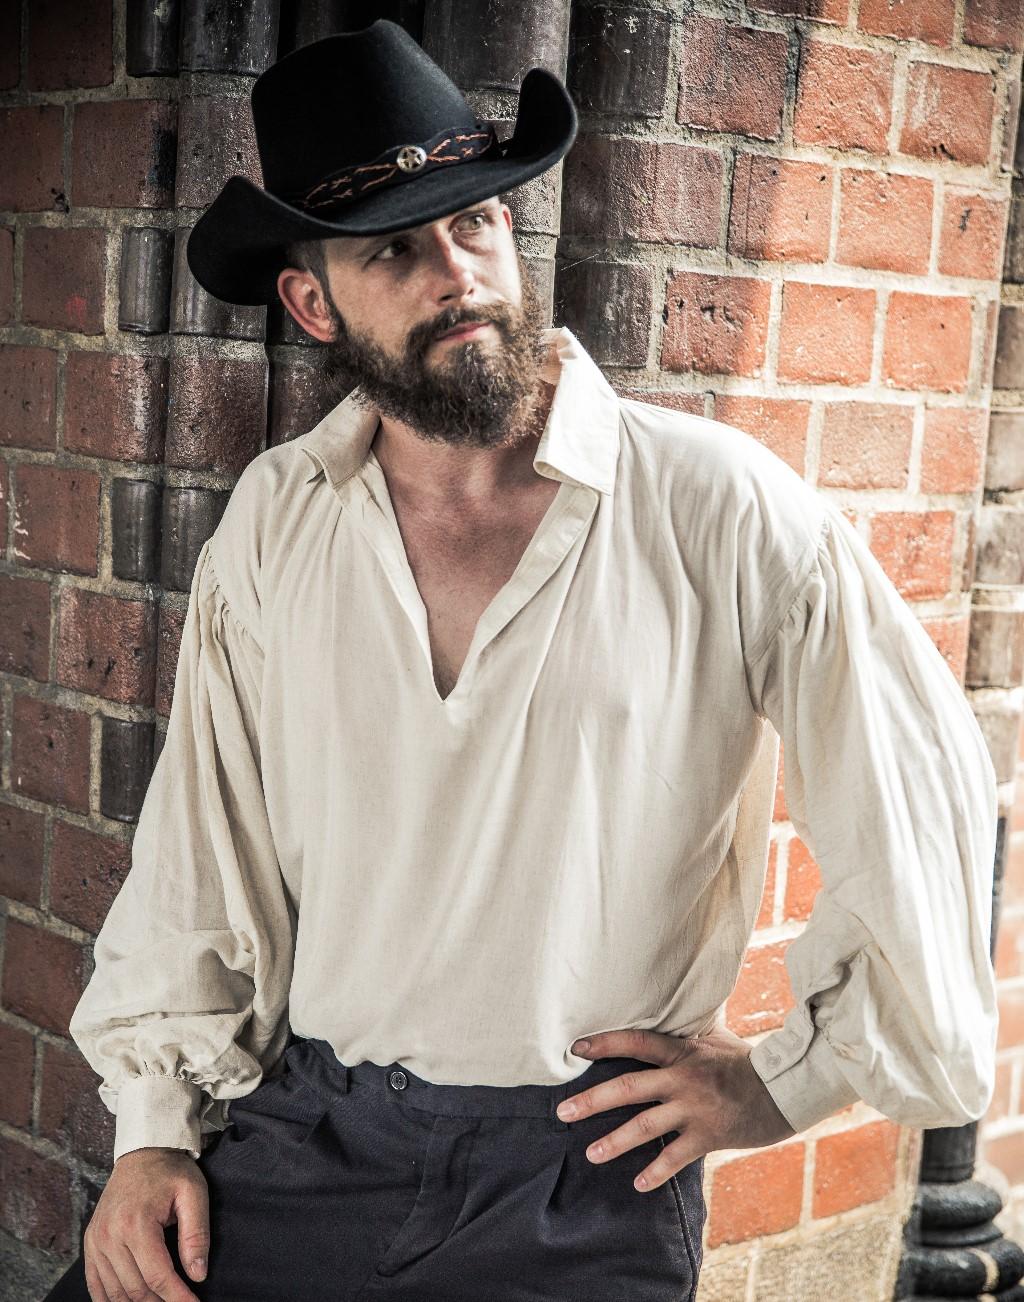 Cowboy Kleidung